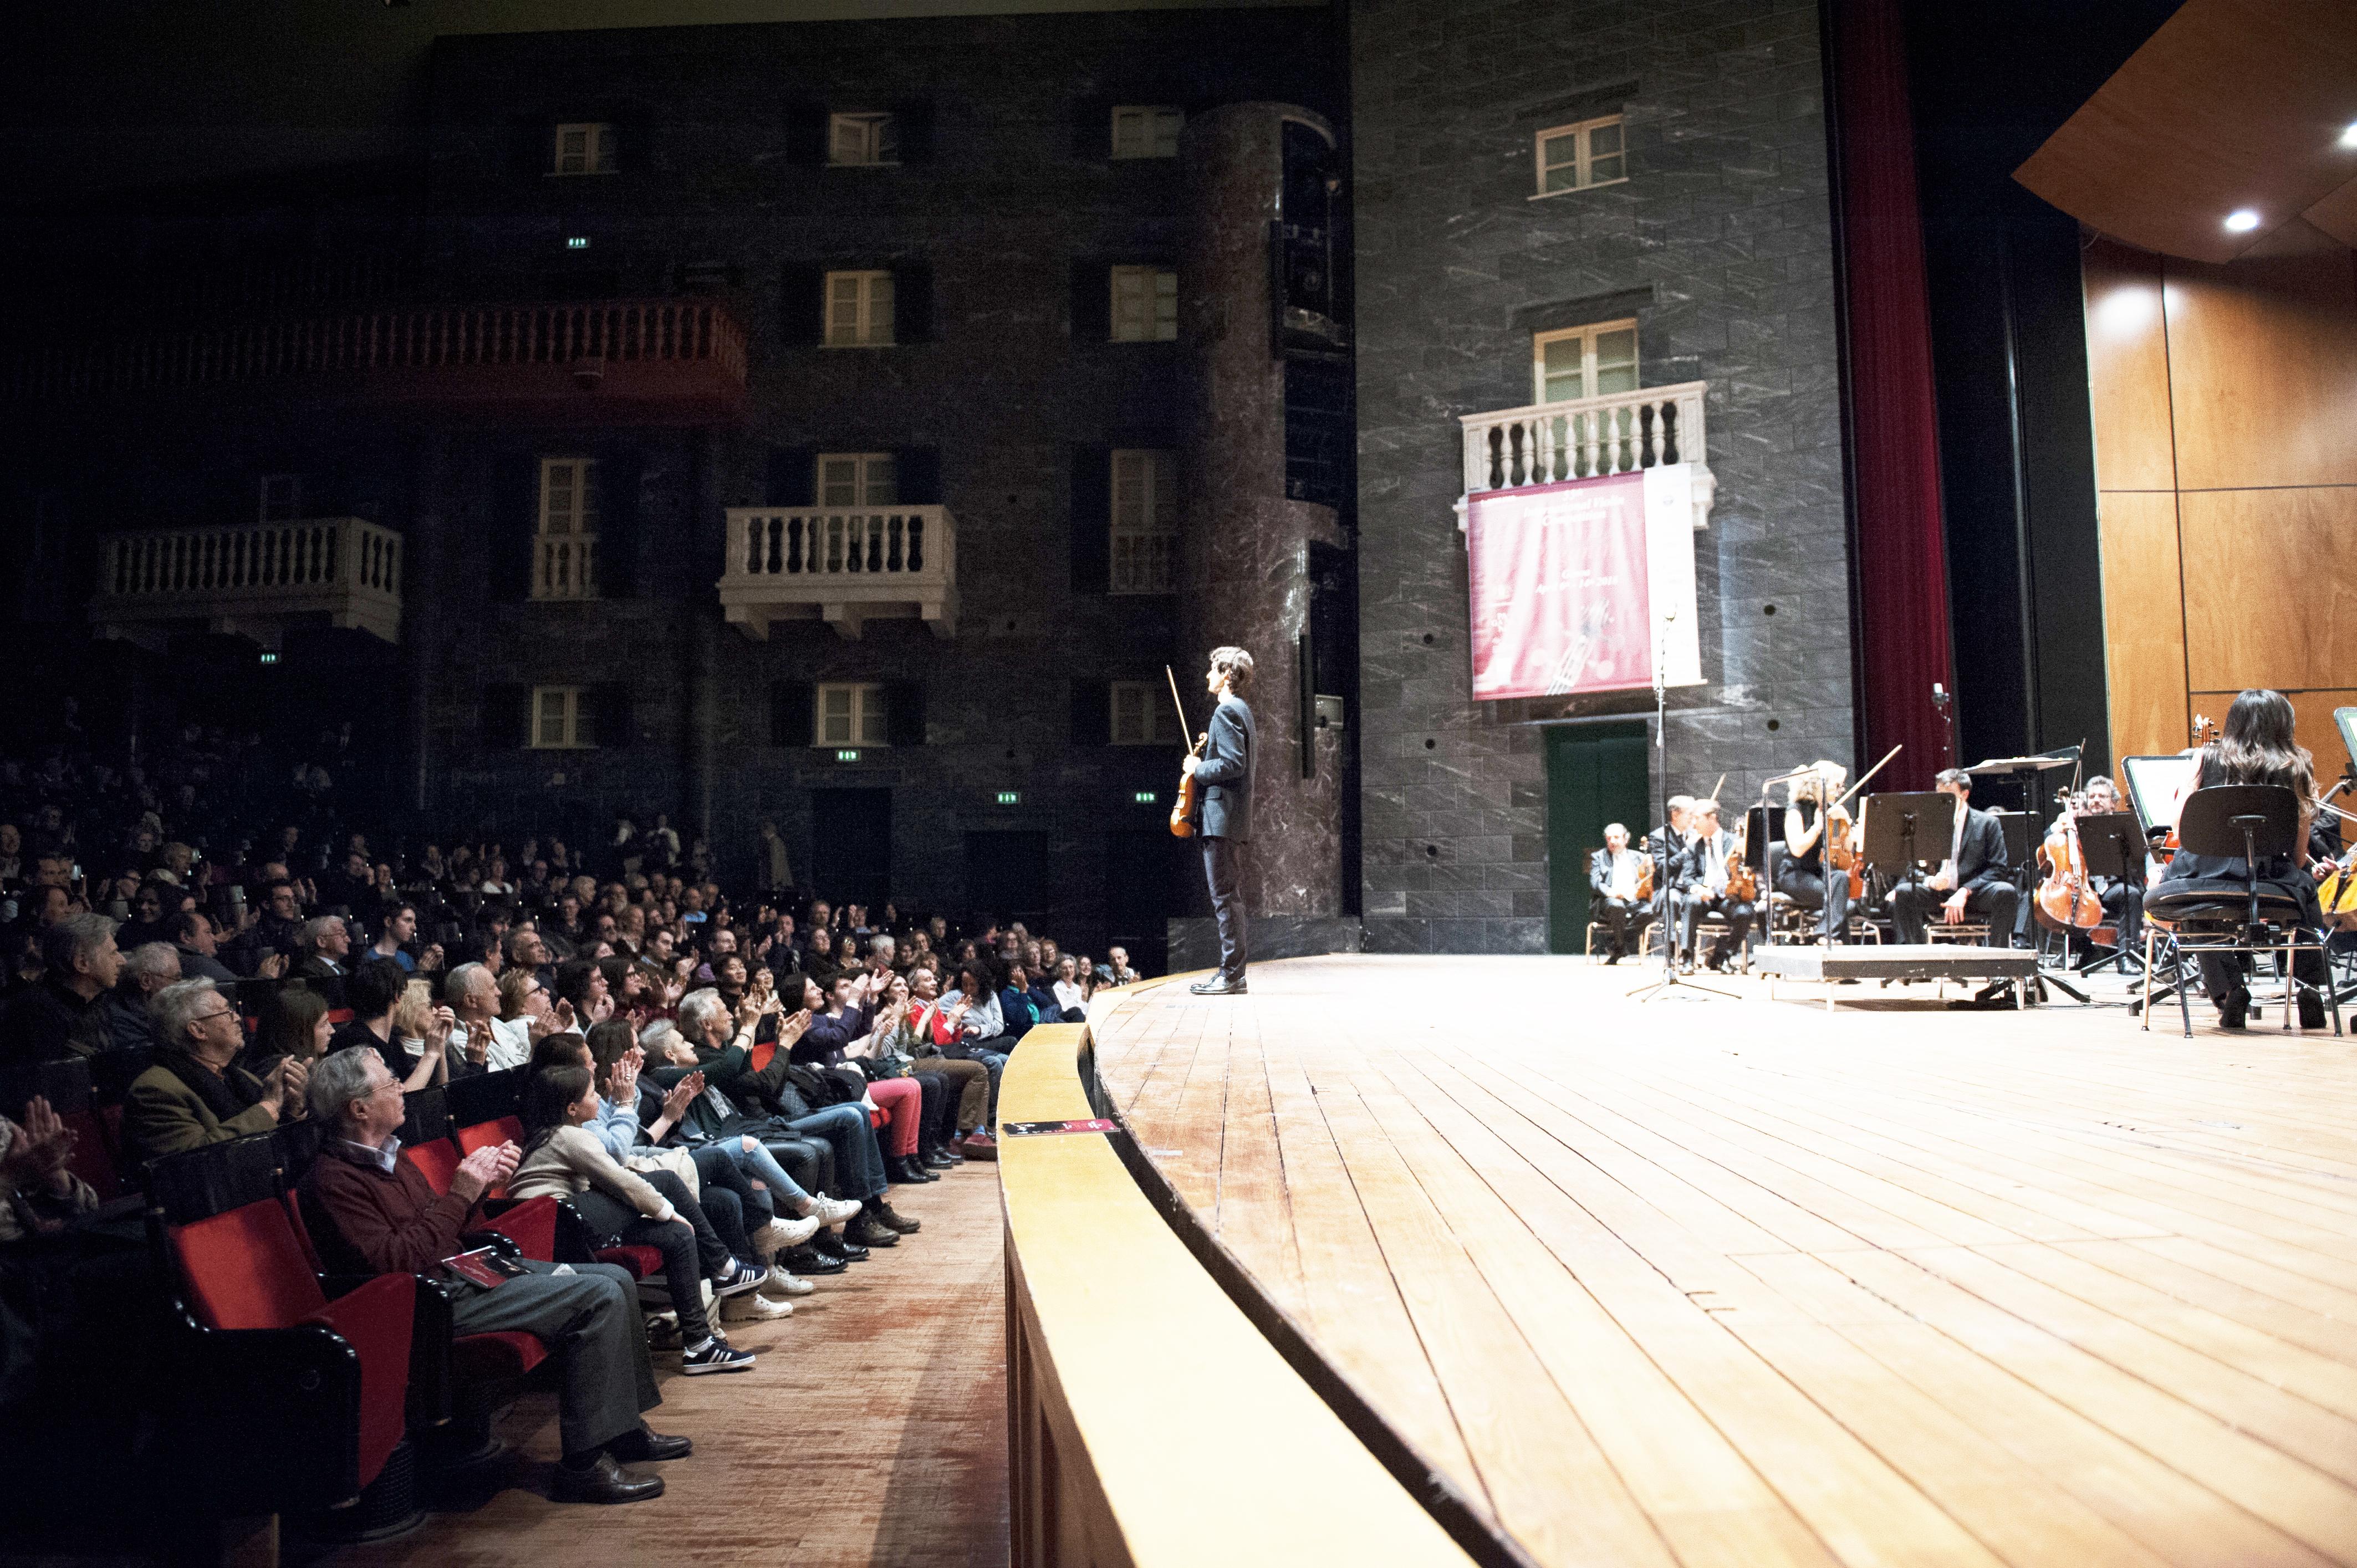 Pushkarenko Teatro Carlo Felice